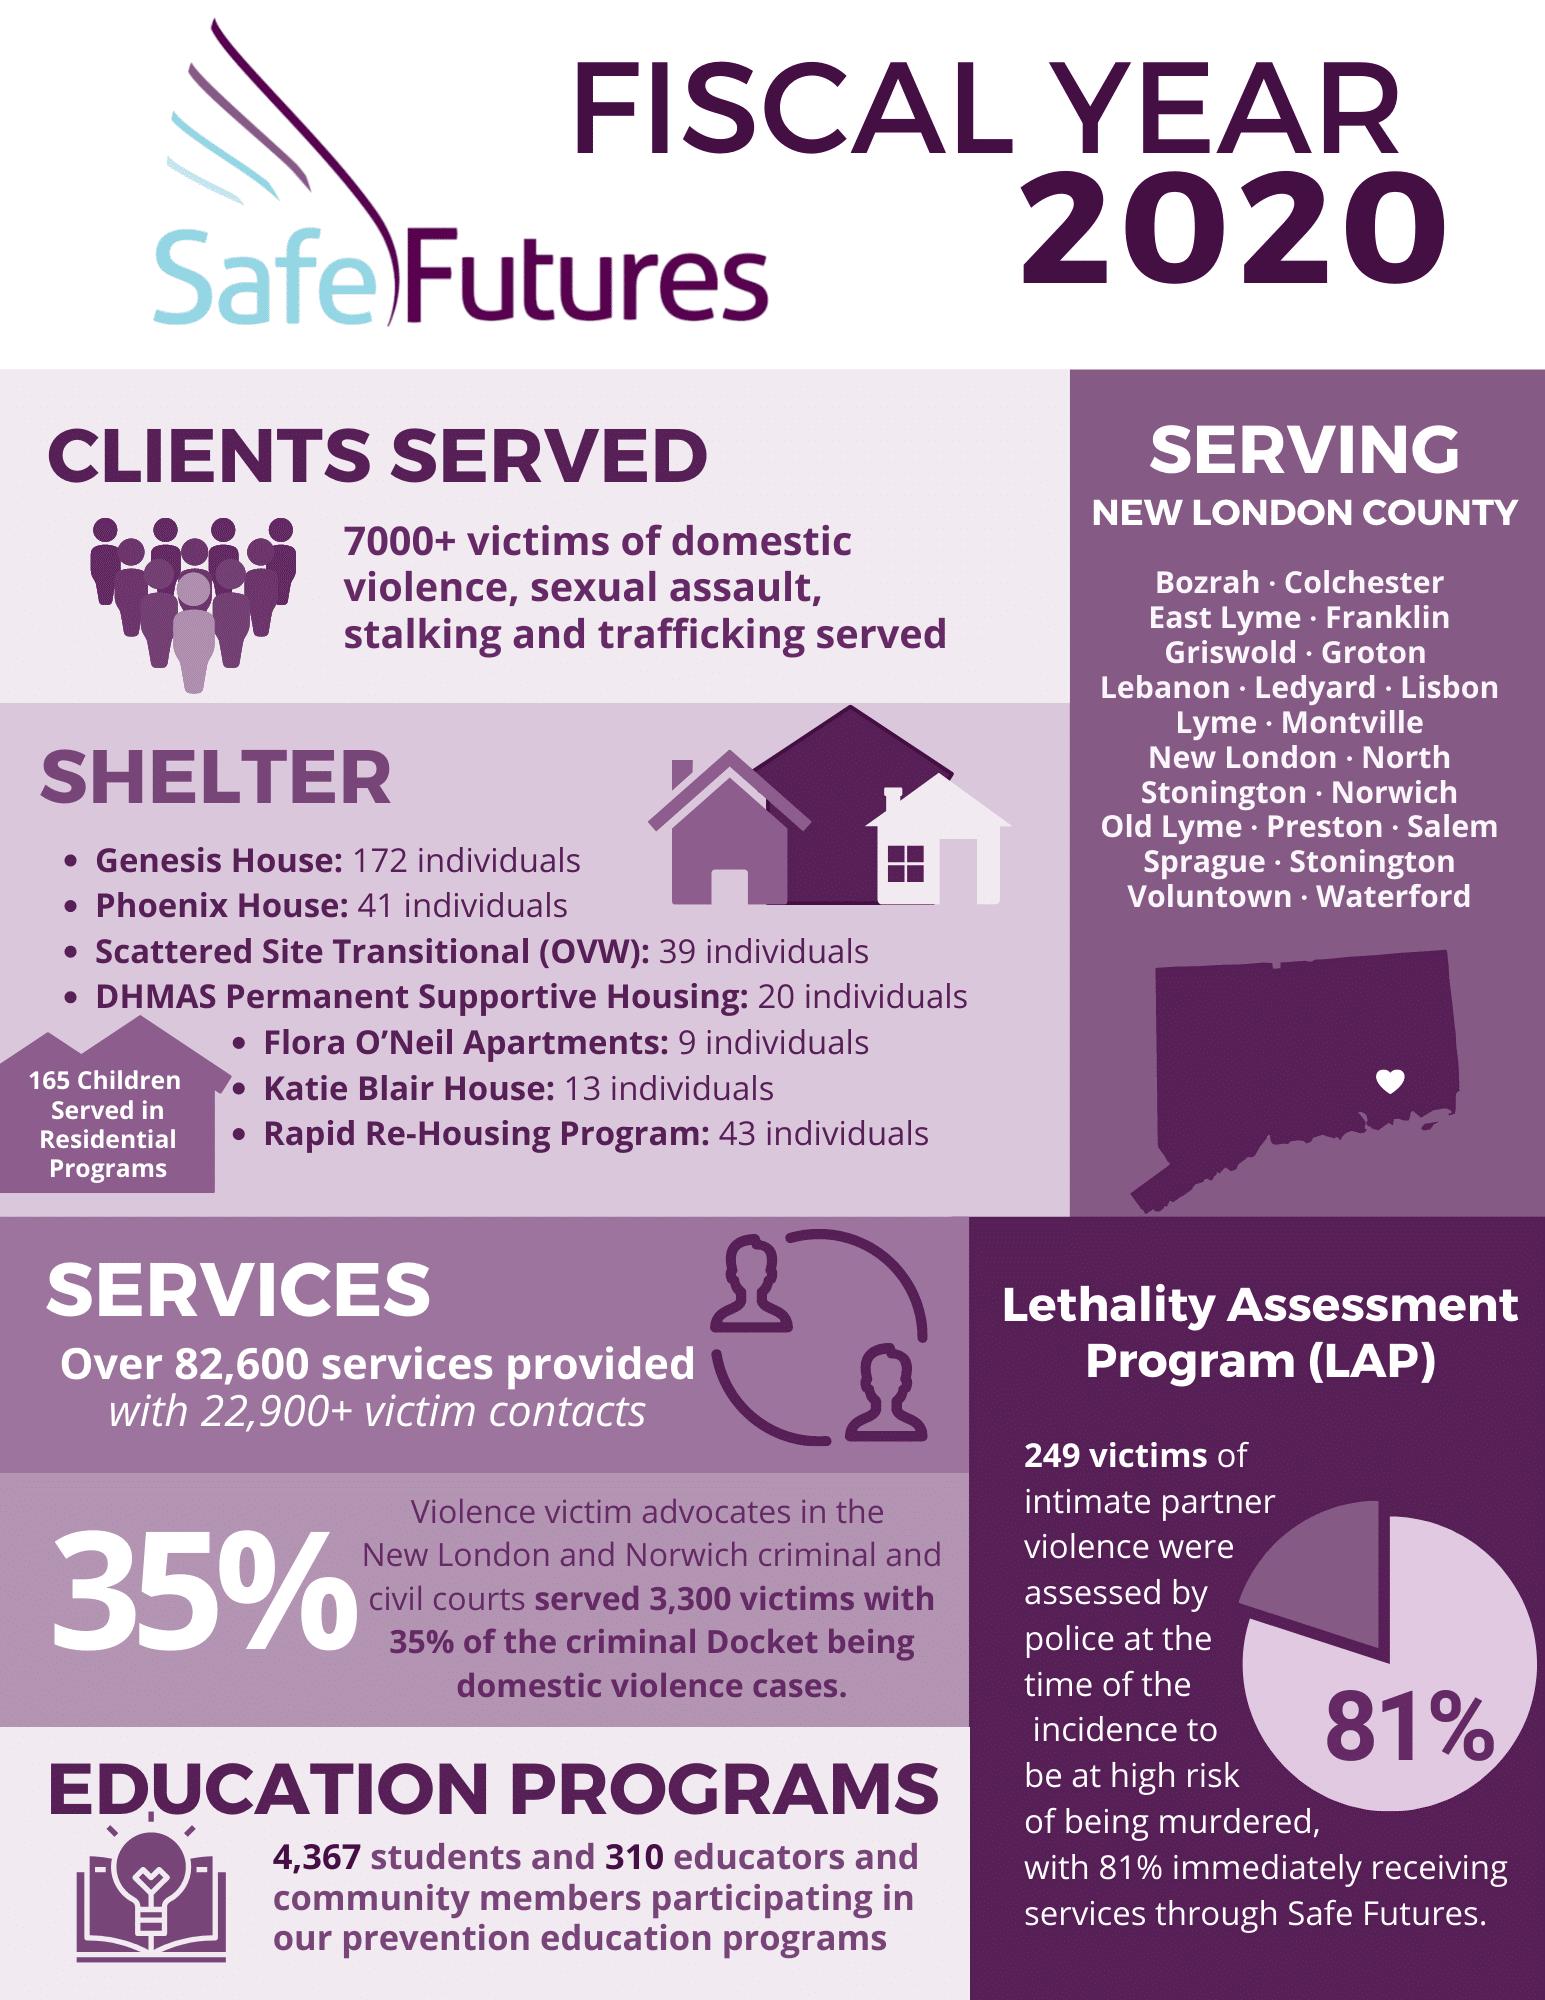 Safe Futures 2020 Infographic Jan 2021